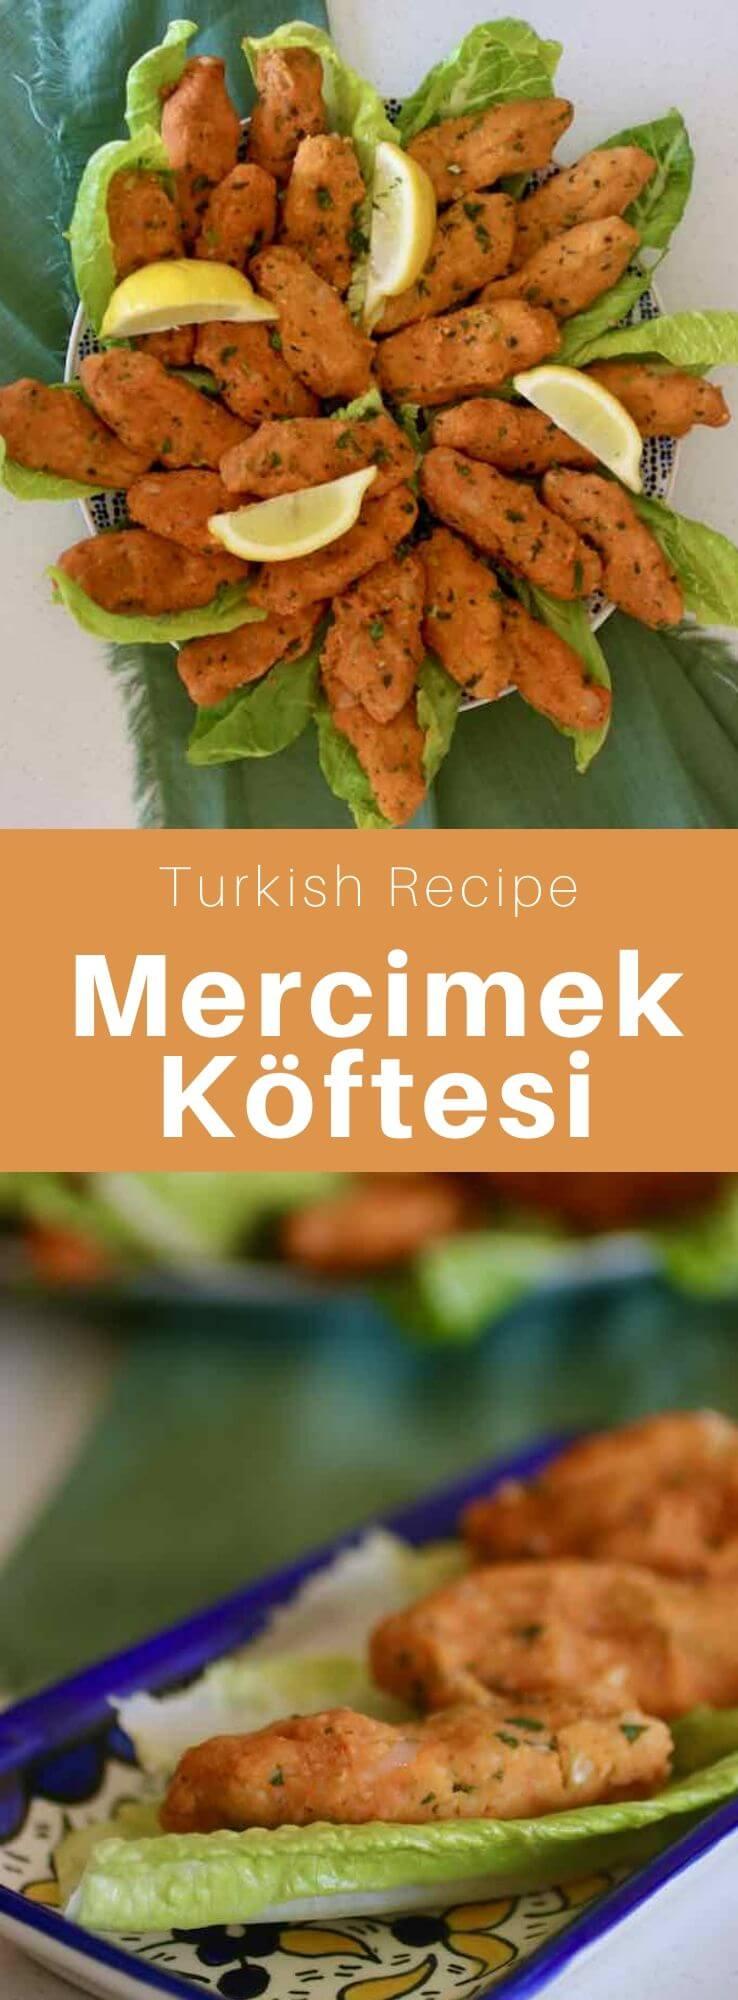 Mercimek köftesi, one of the most popular mezze of Turkish cuisine, are vegan dumplings made with red lentils and bulgur. #Turkey #Turkish #TurkishRecipe #TurkishFood #TurkishCuisine #WorldCuisine #196flavors